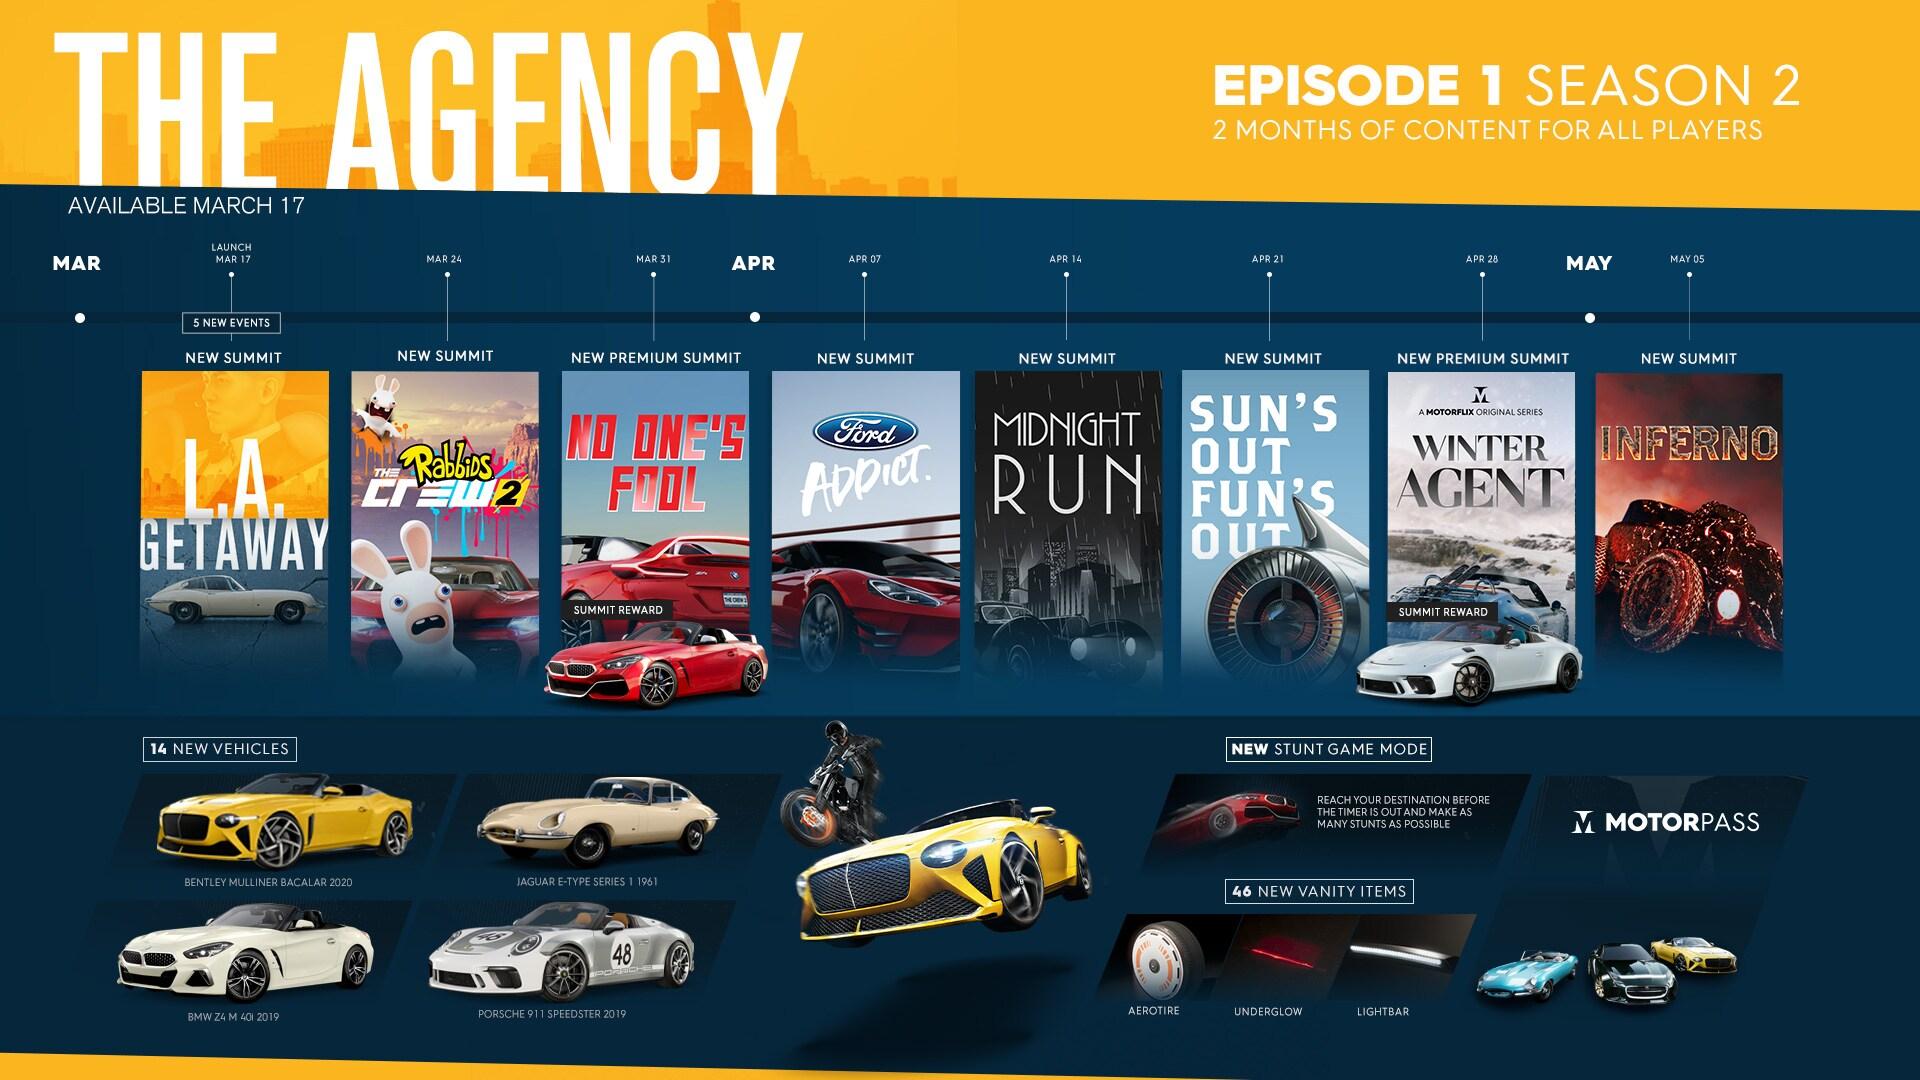 The Crew 2 Season 2 Episode 1: The Agency - Image 8